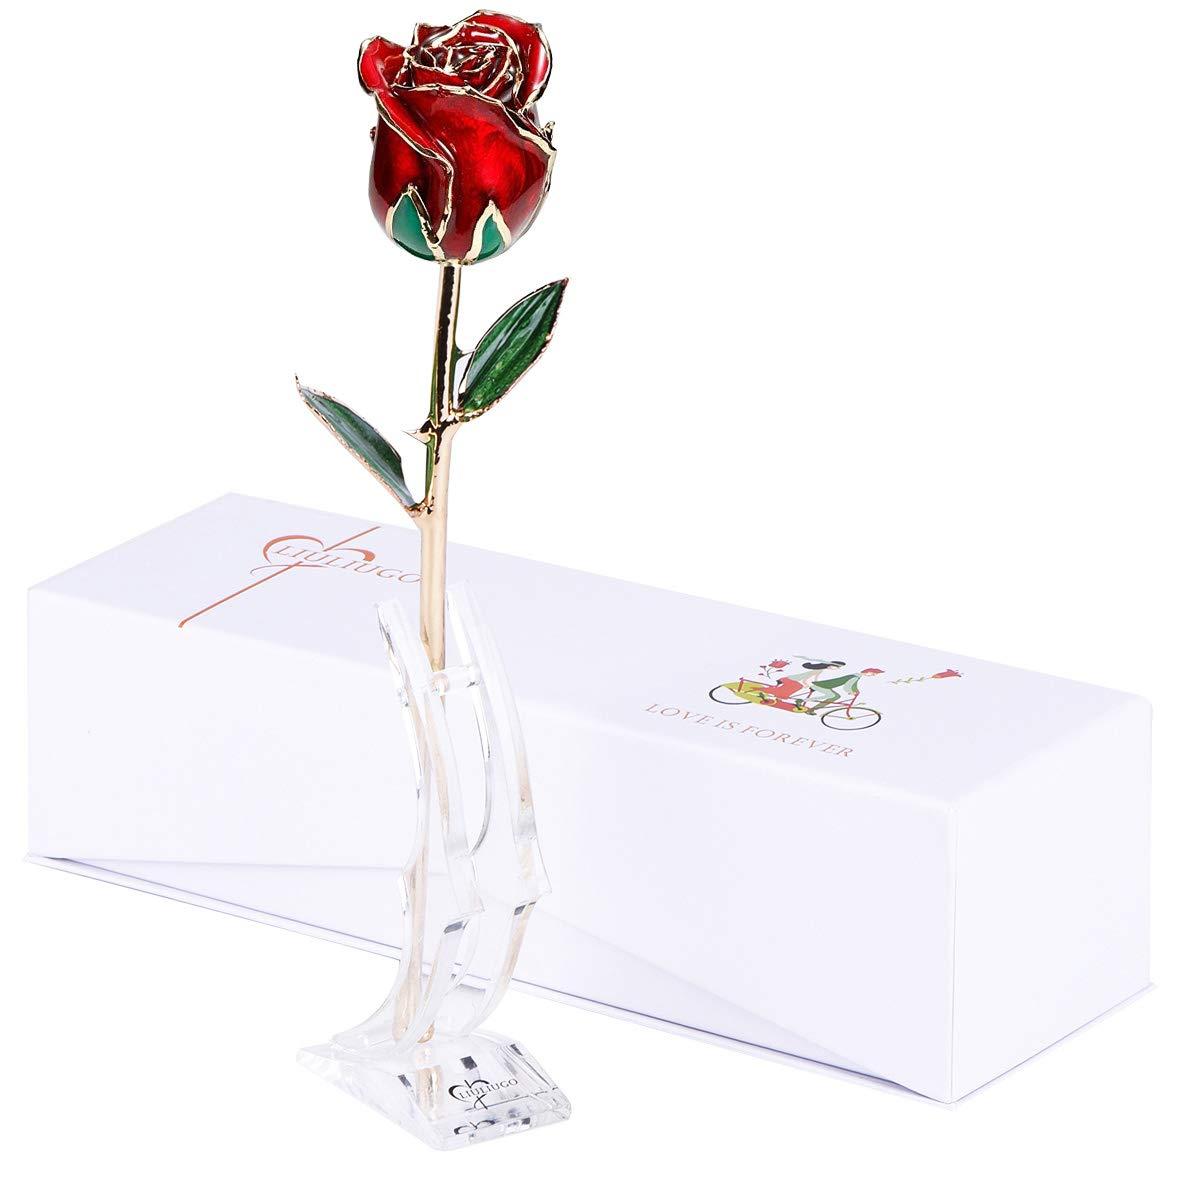 LiuLiugo 24Kゴールドローズ 女性用 卒業ギフト 本物のフレッシュな長い茎のバラの花 バレンタインデー、母の日、クリスマス、記念日、誕生日に最適なギフト B07QGVNB4Z